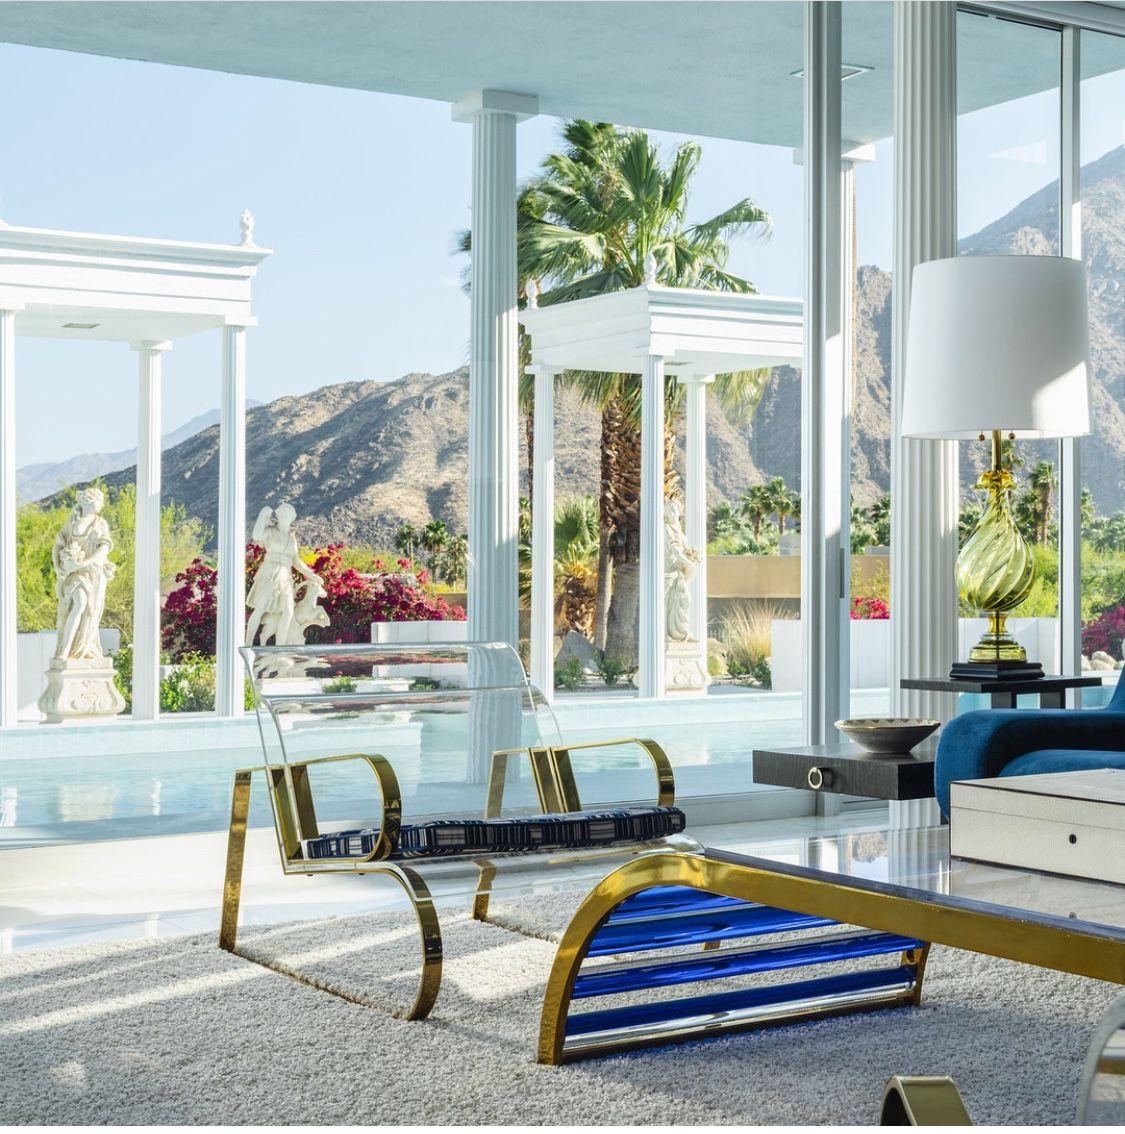 Best Idea By Jennifergrayart Com On Adroit Design 26 Palm 400 x 300